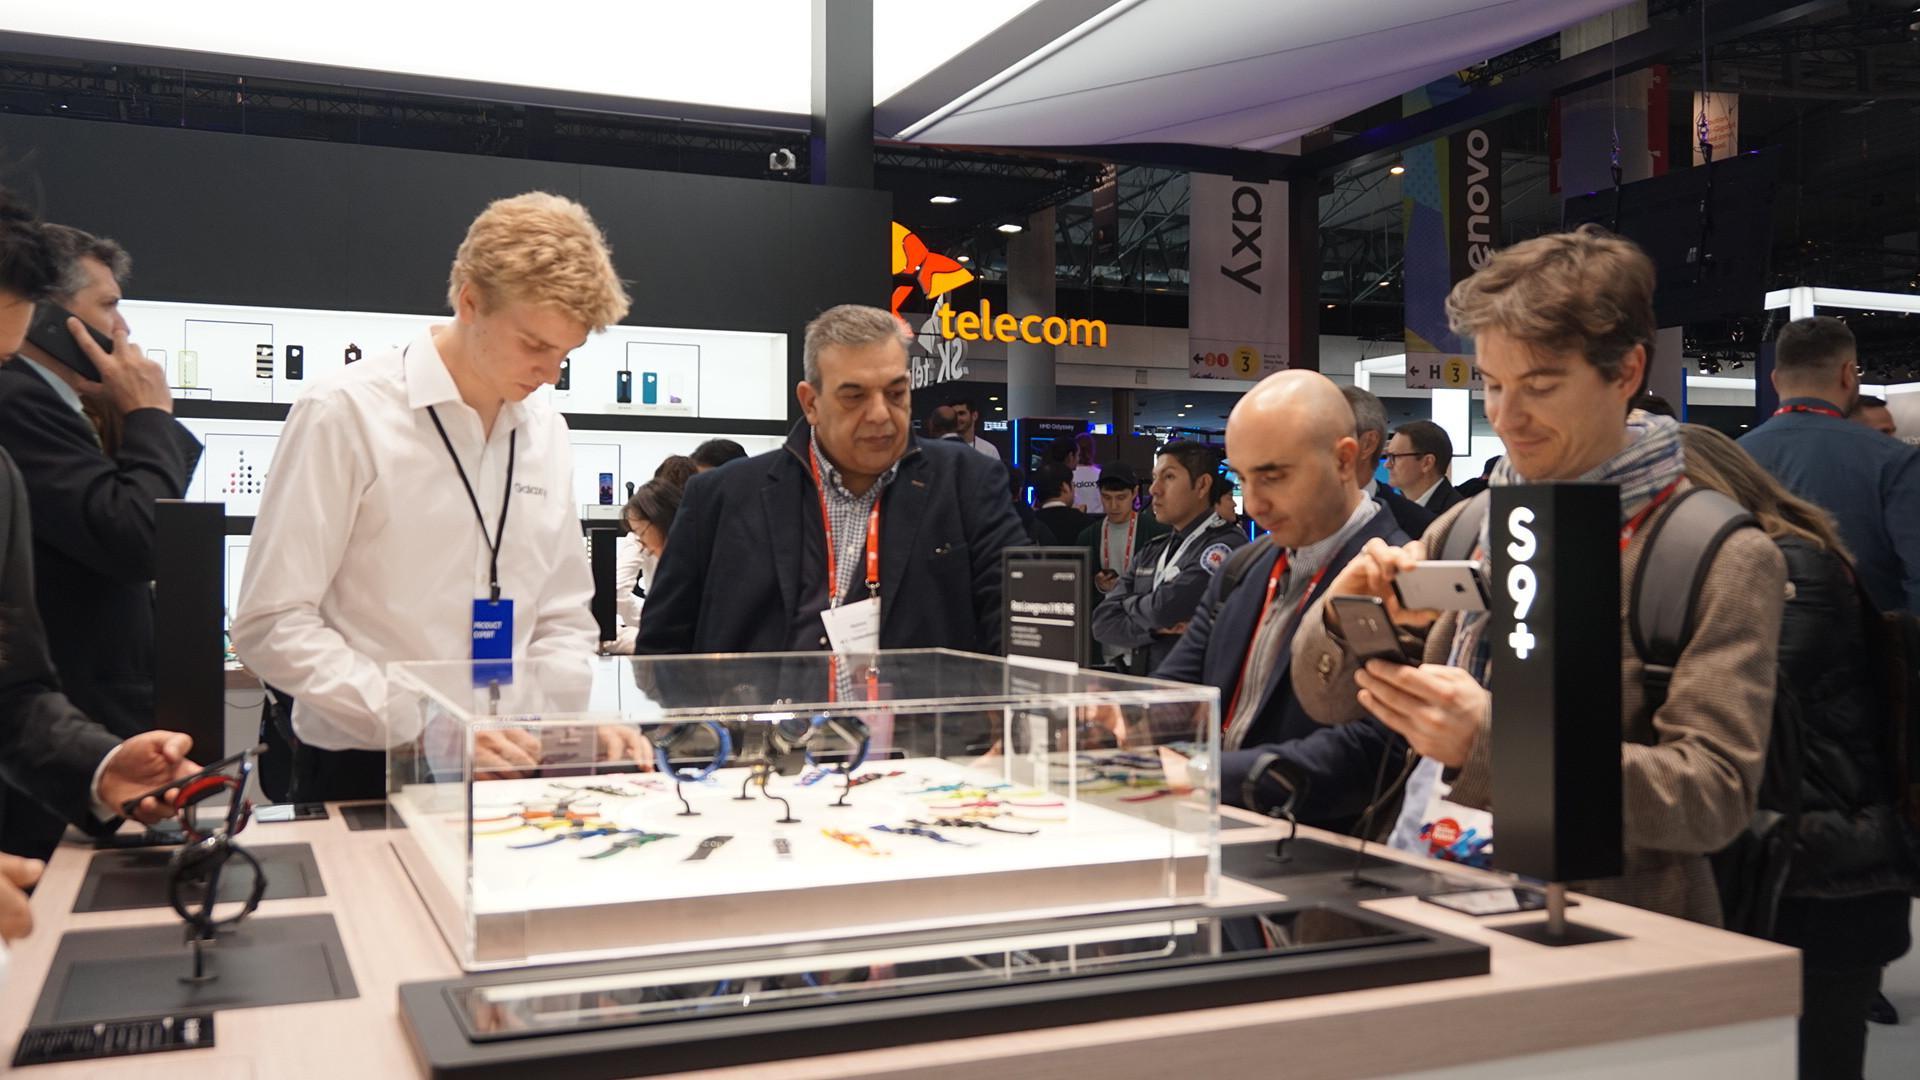 Suasana booth Samsung di gelaran Mobile World Congress 2018 di Barcelona, Spanyol, pengunjung melihat-lihat ekosistem Gear Smart Watch Samsung (Liputan6.com/ Agustin Setyo W)